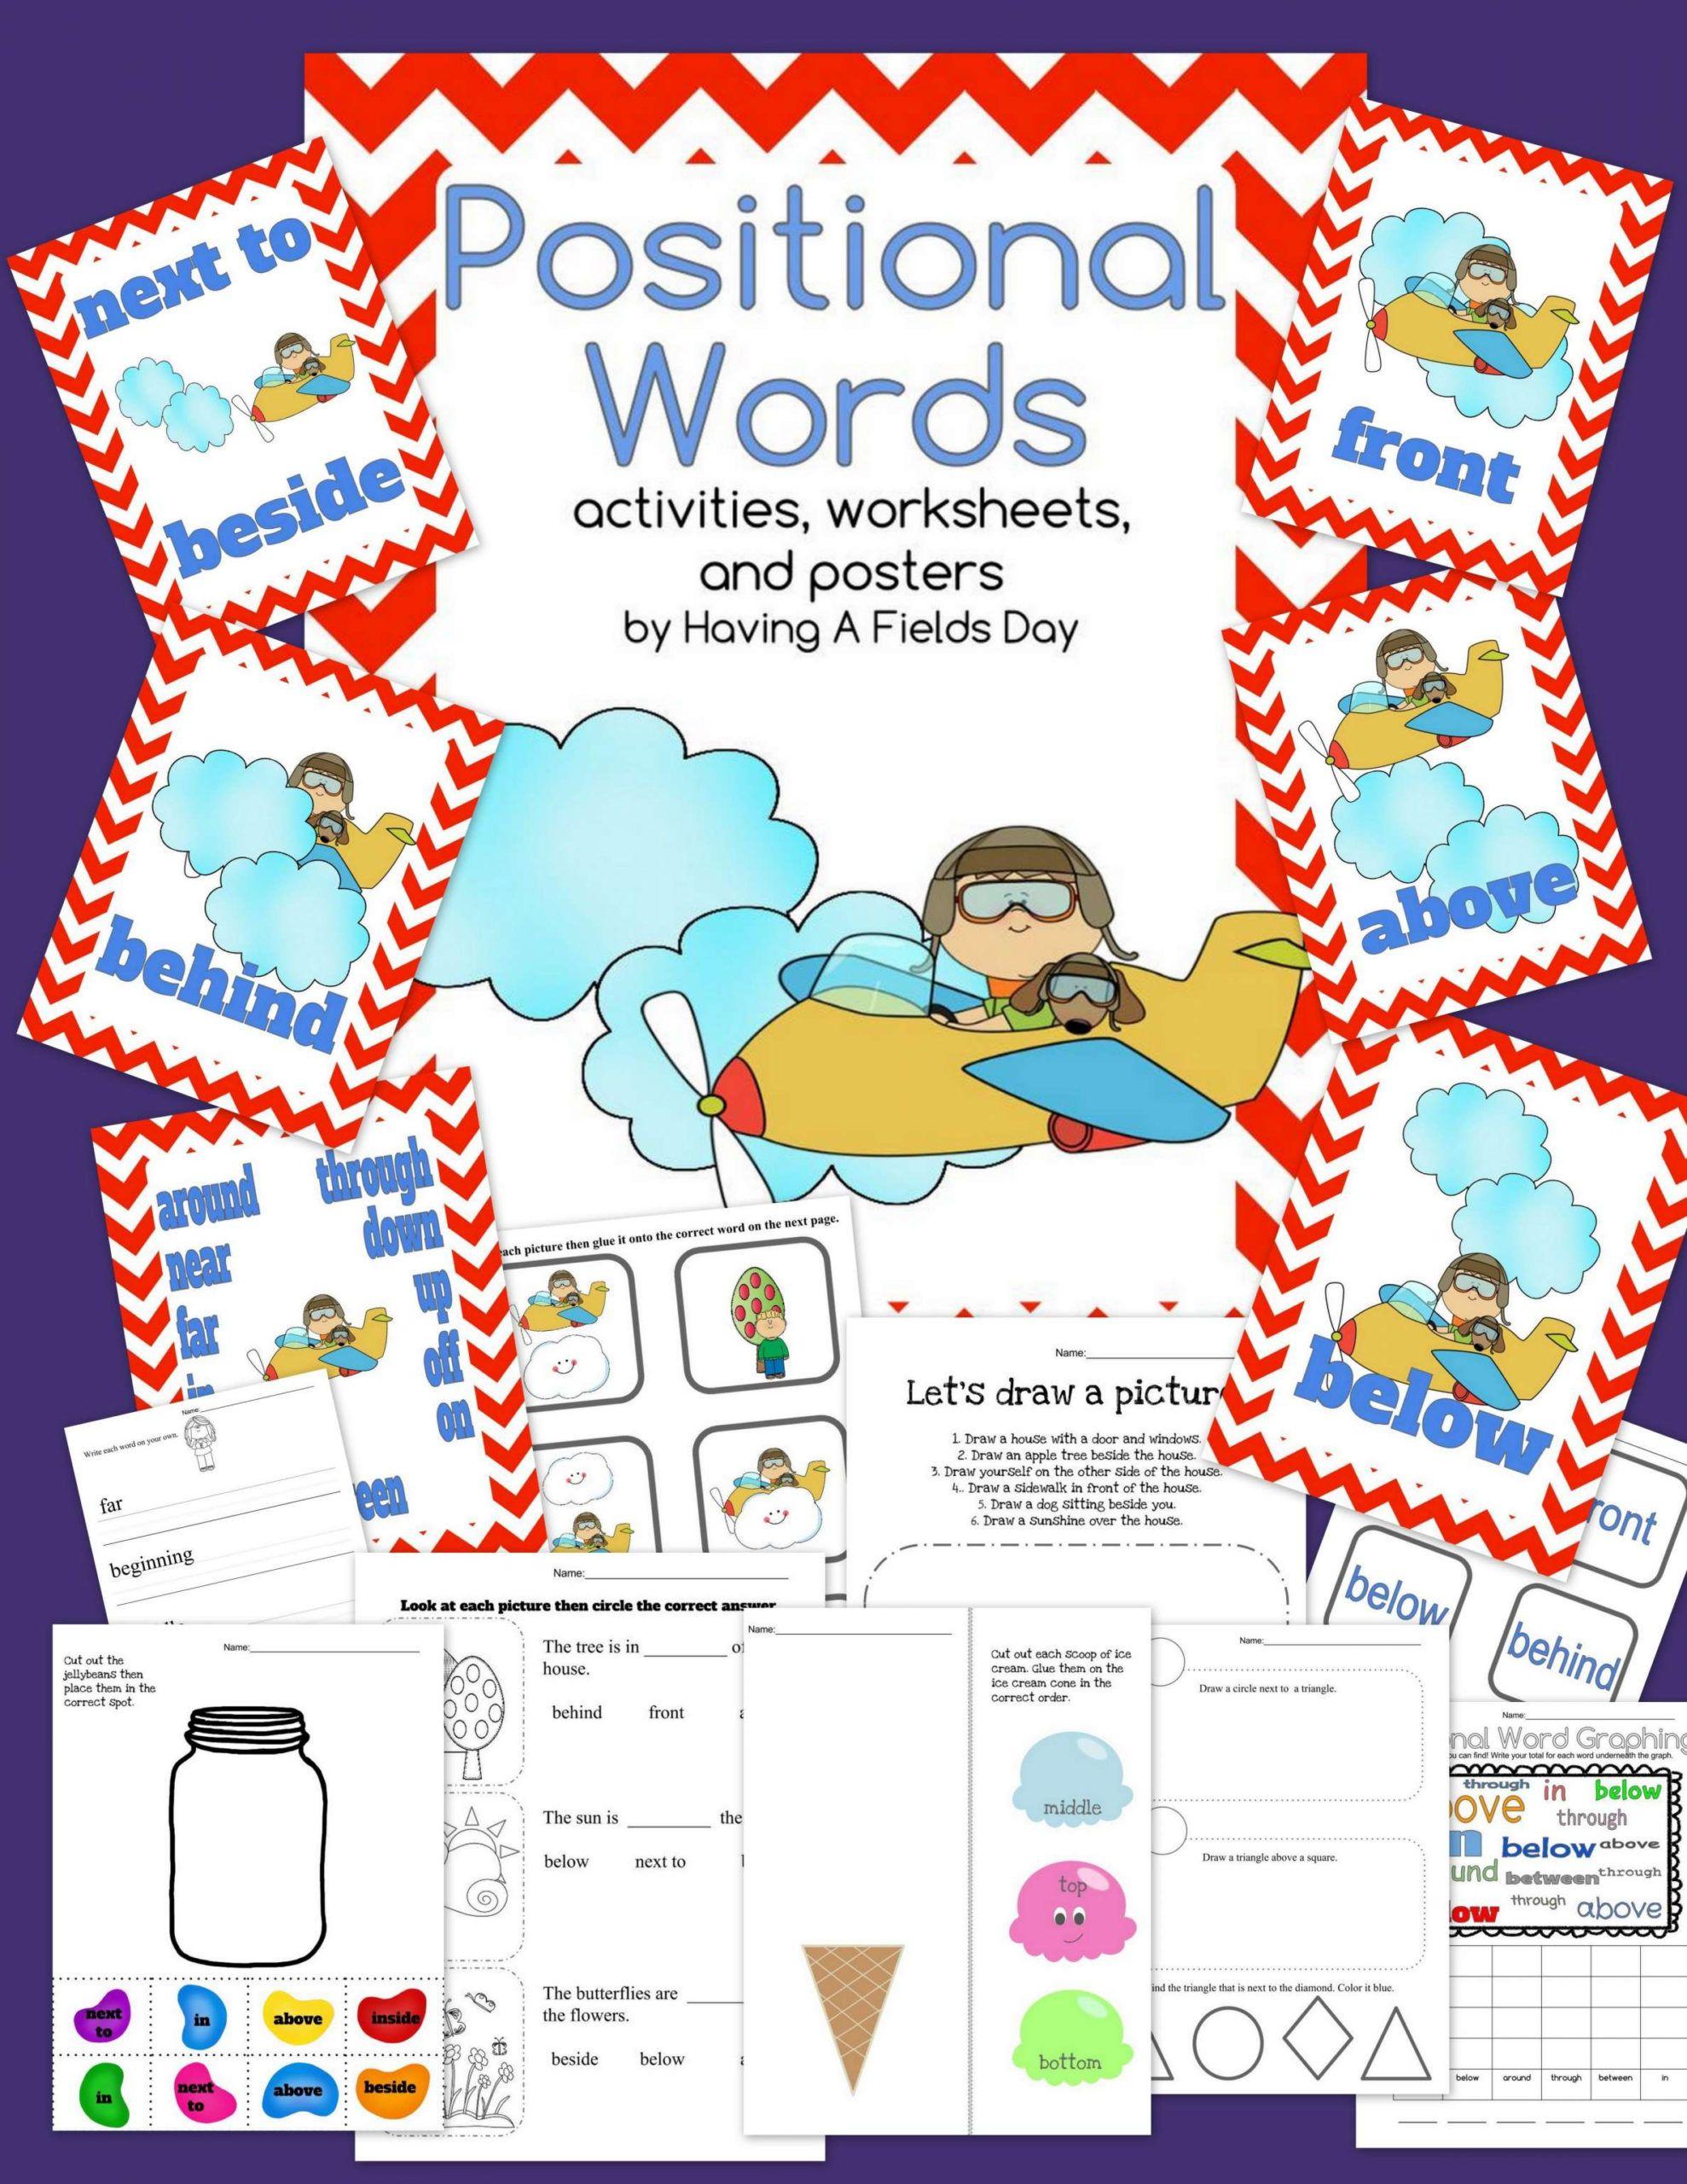 Preschool Positional Words Worksheet And Positional Words